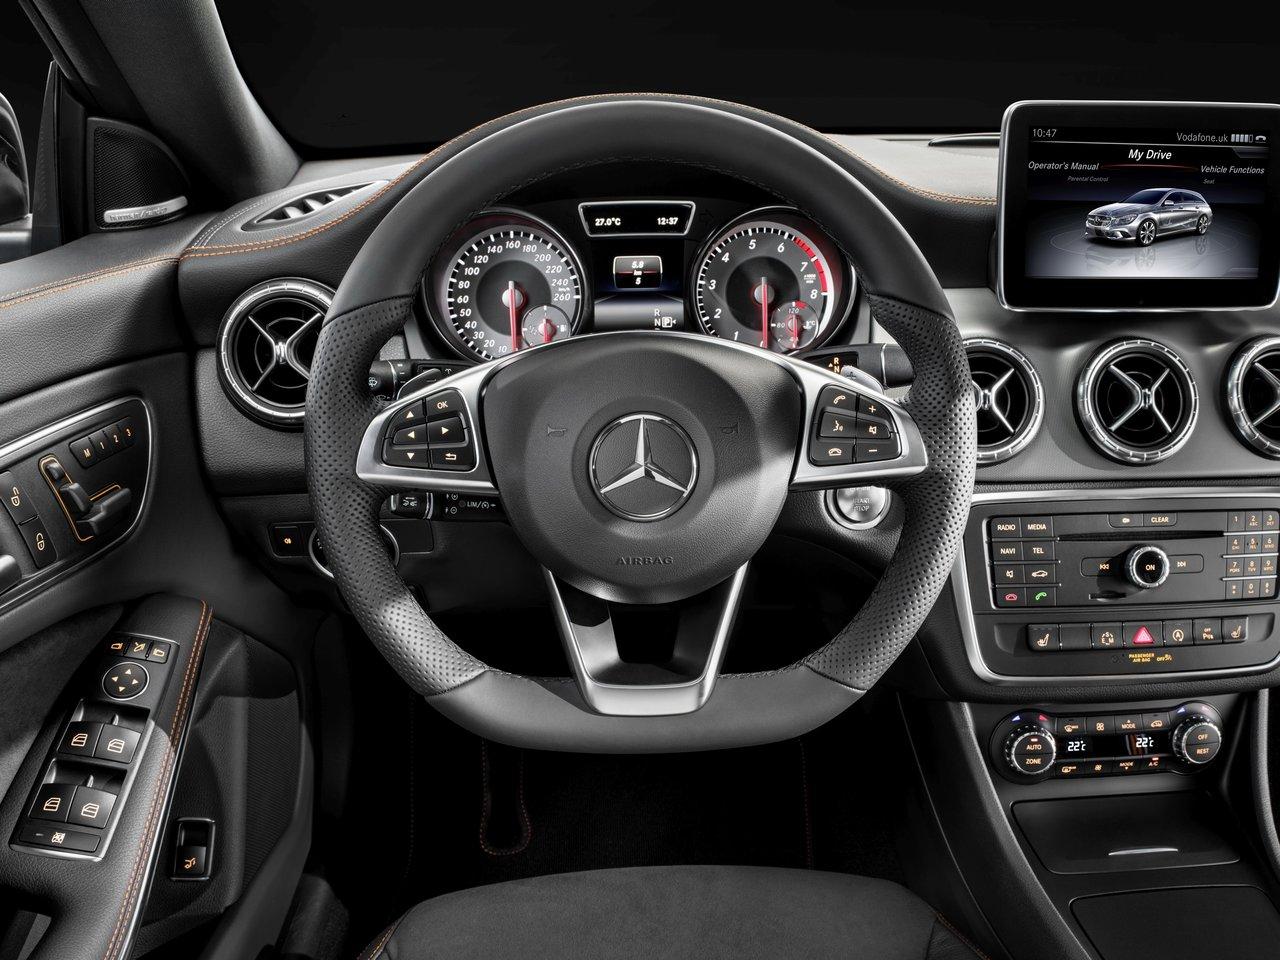 Снимки: Mercedes-benz CLA ShootingBrake